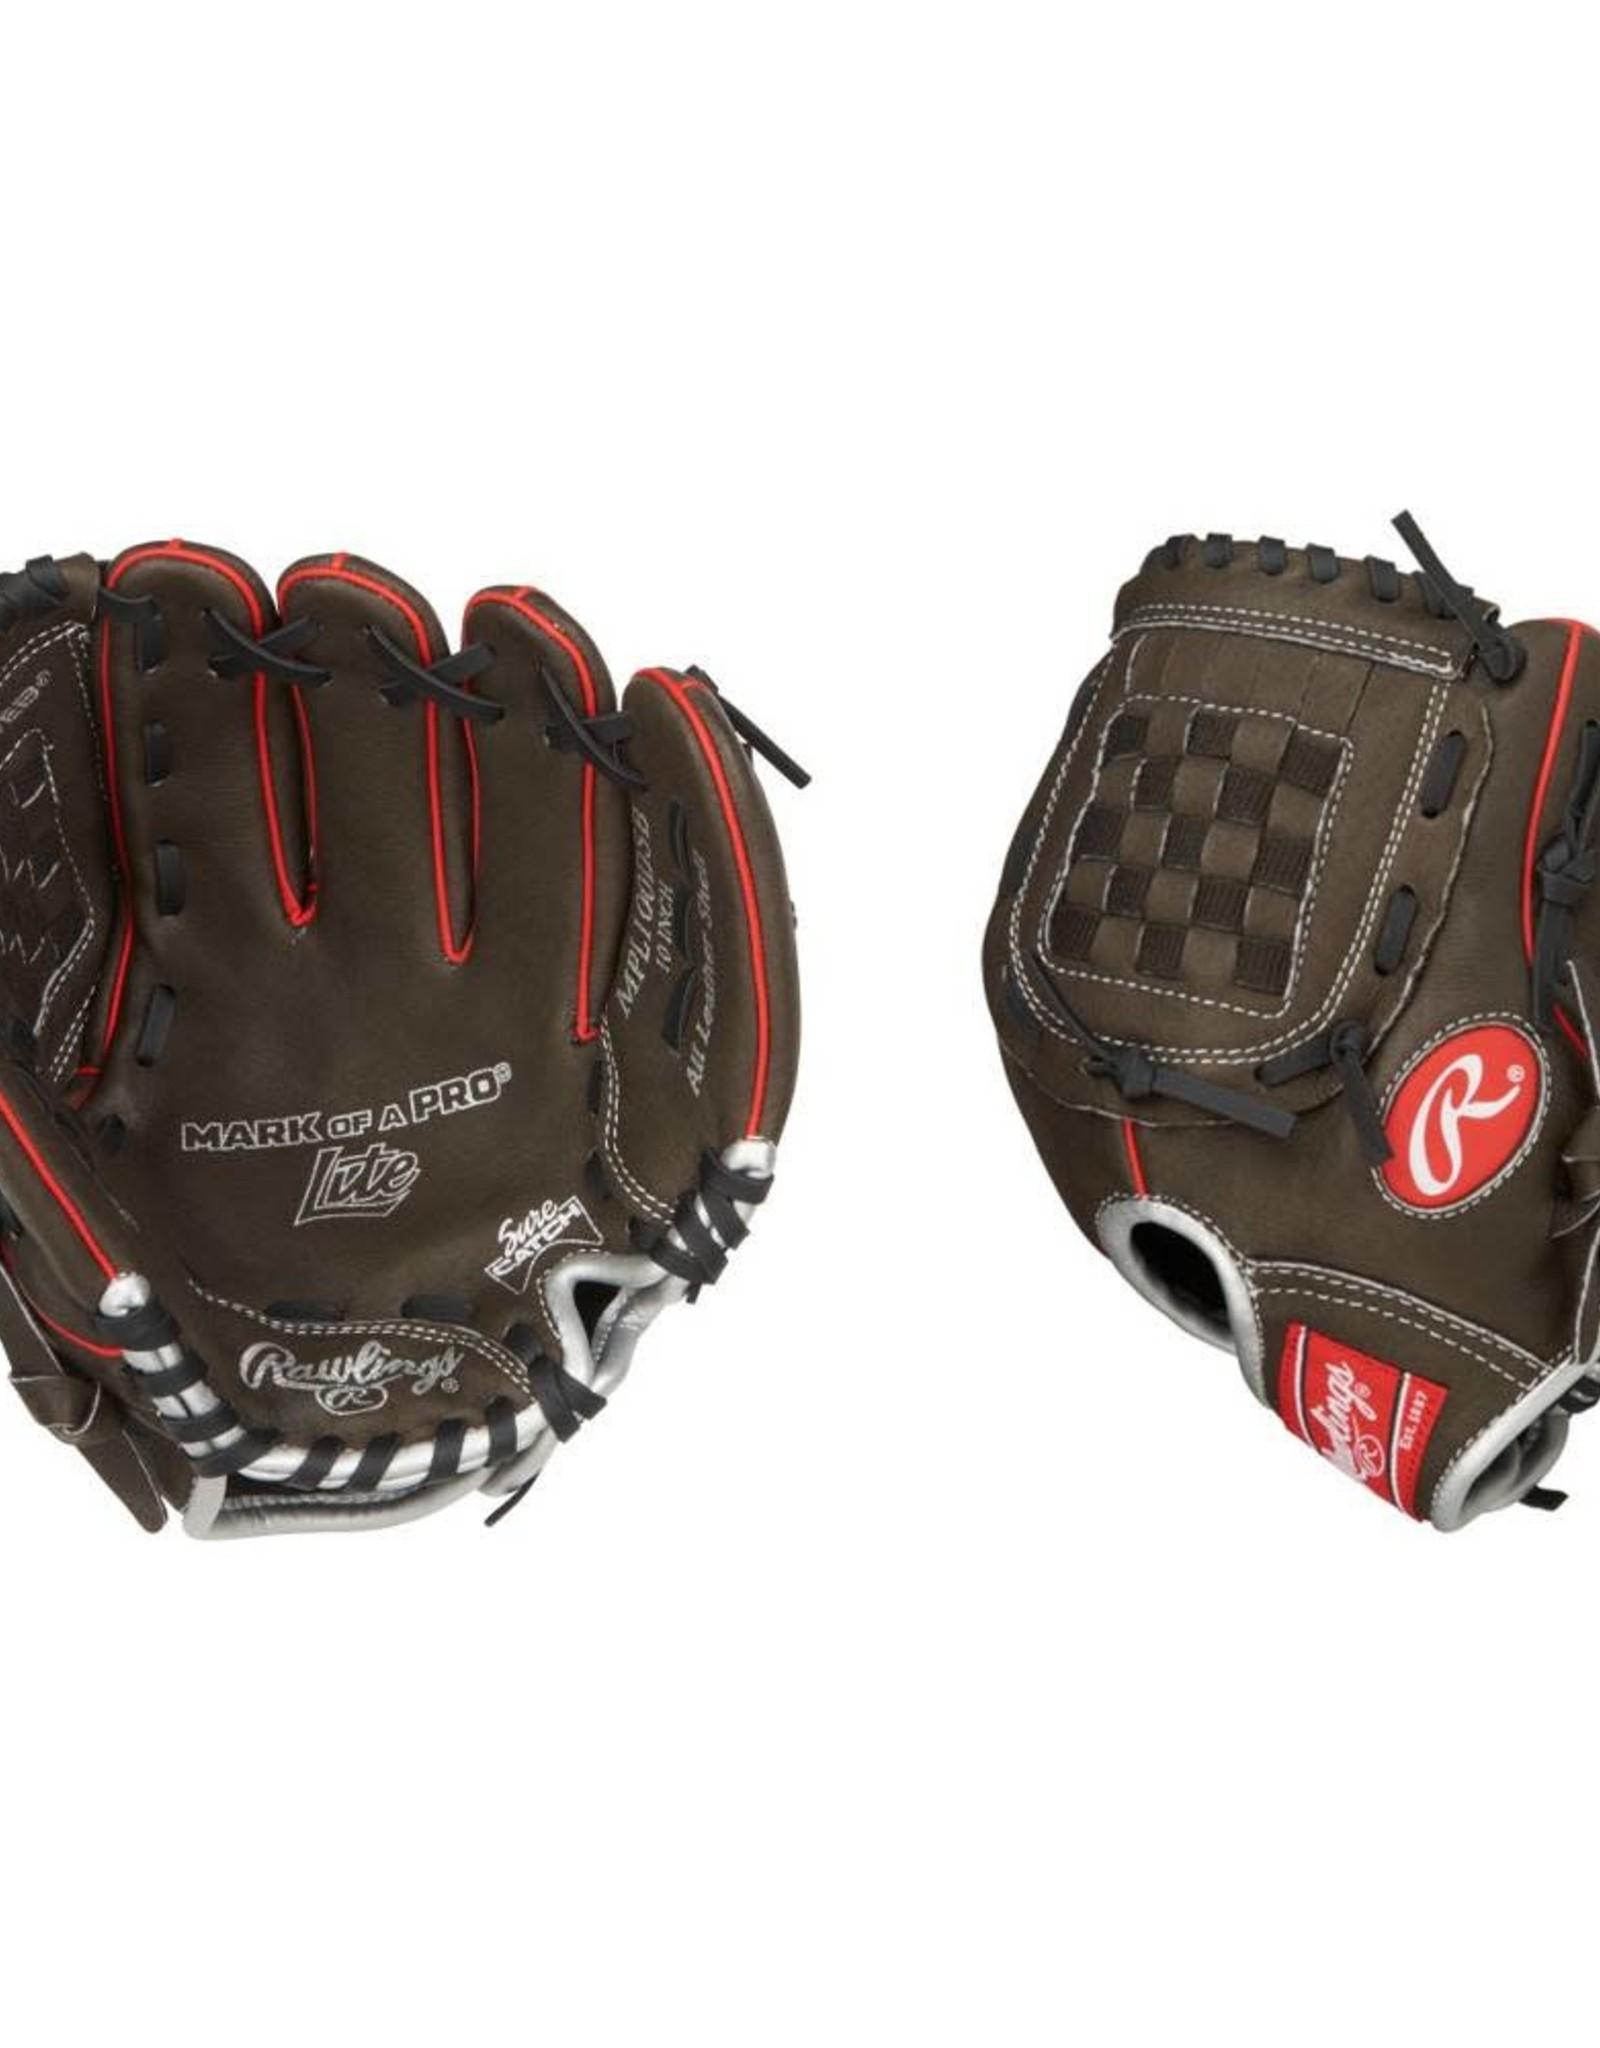 Rawlings Gant Baseball Mark of a Pro